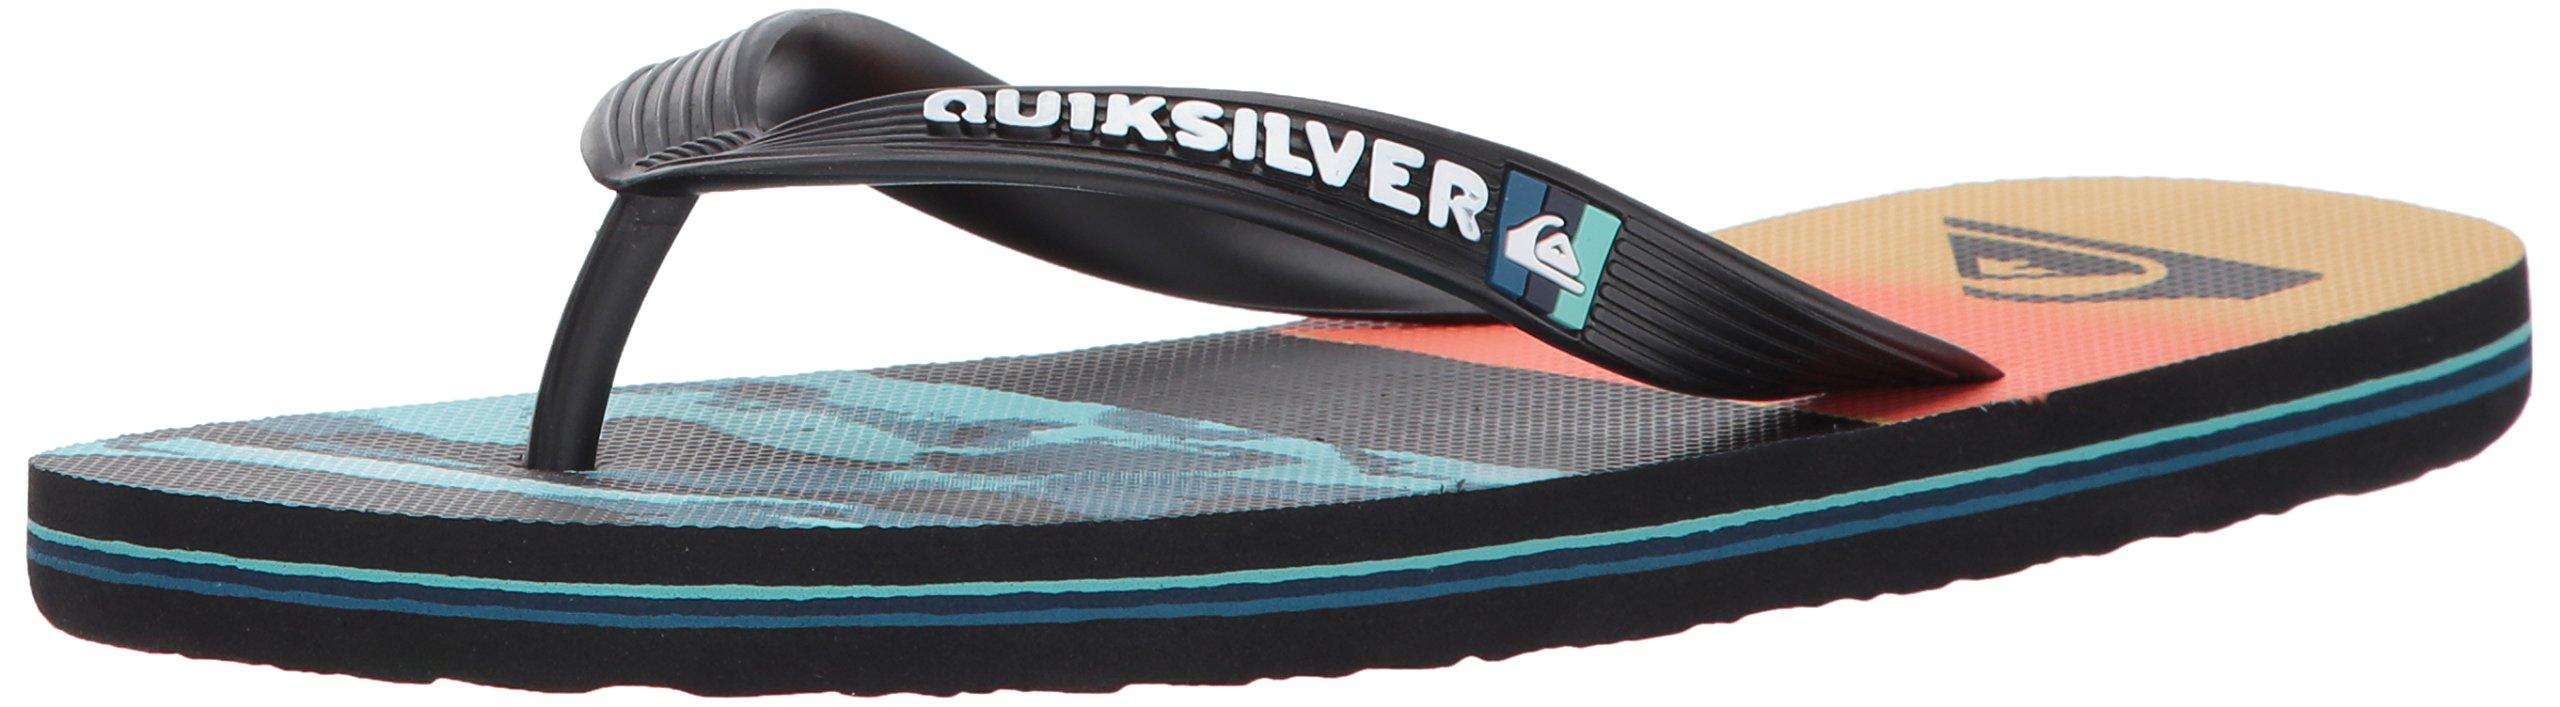 Quiksilver Men's Molokai Resin Camo, Black/Orange/Blue, 11 M US